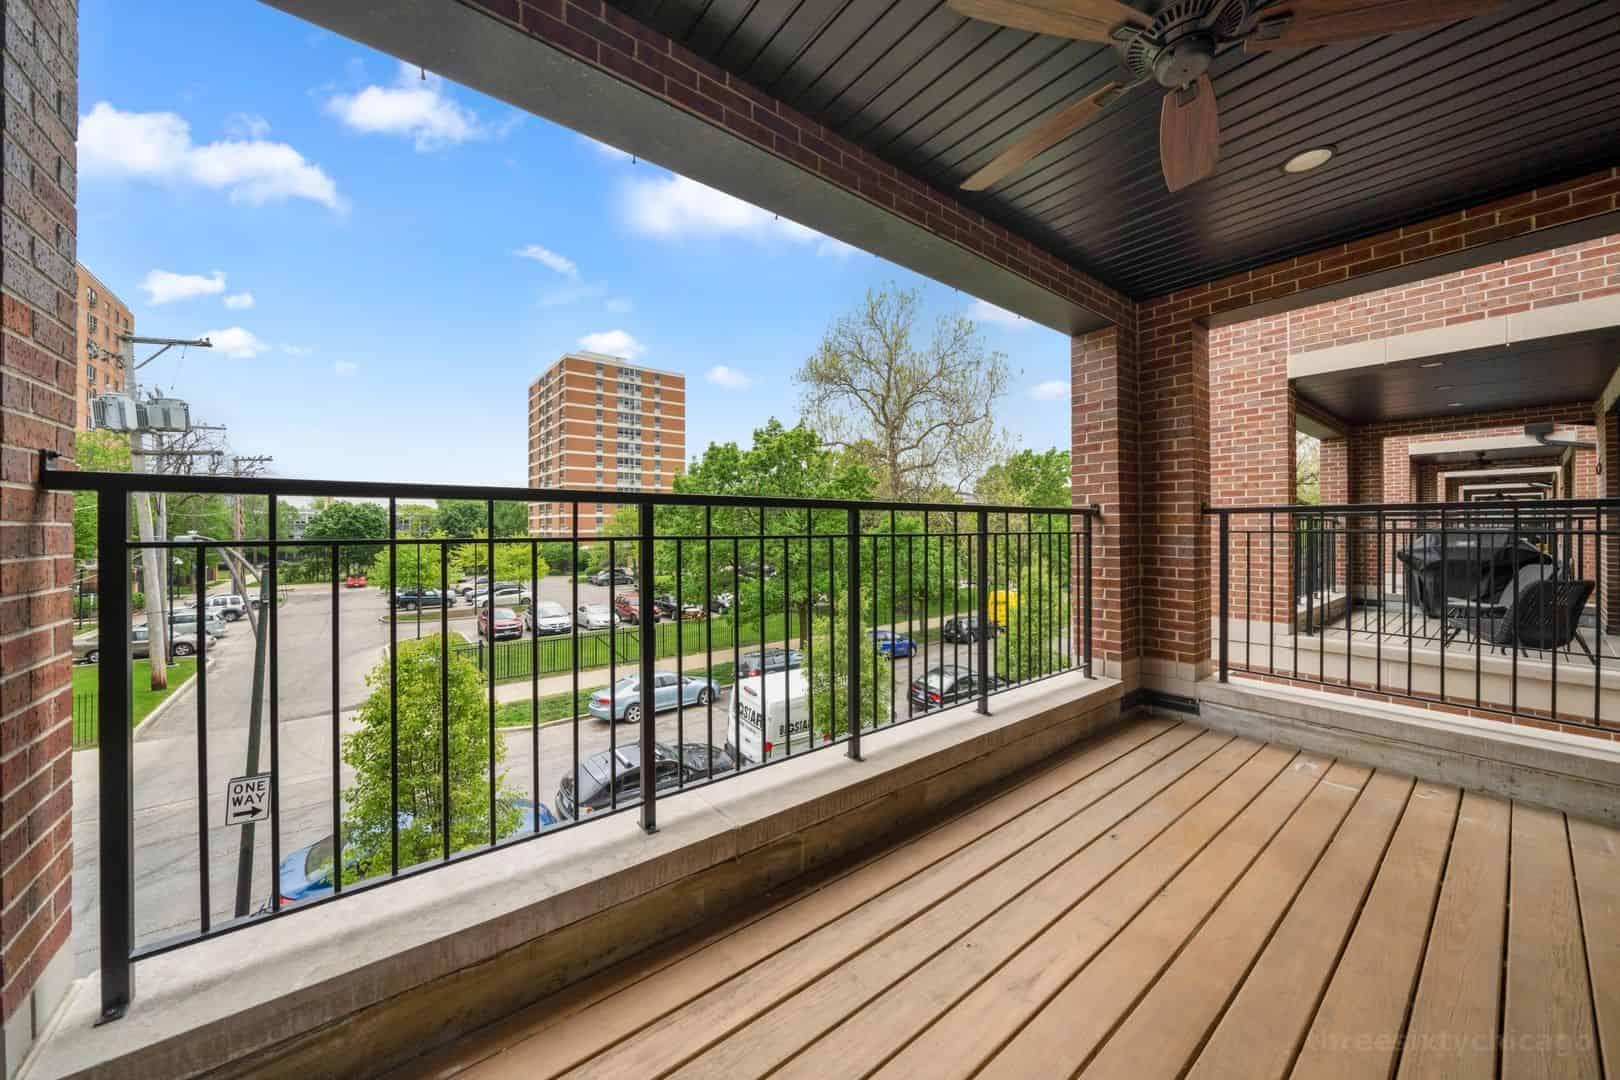 2018 W Le Moyne Street Unit 2E Chicago, IL 60622 - Terrace